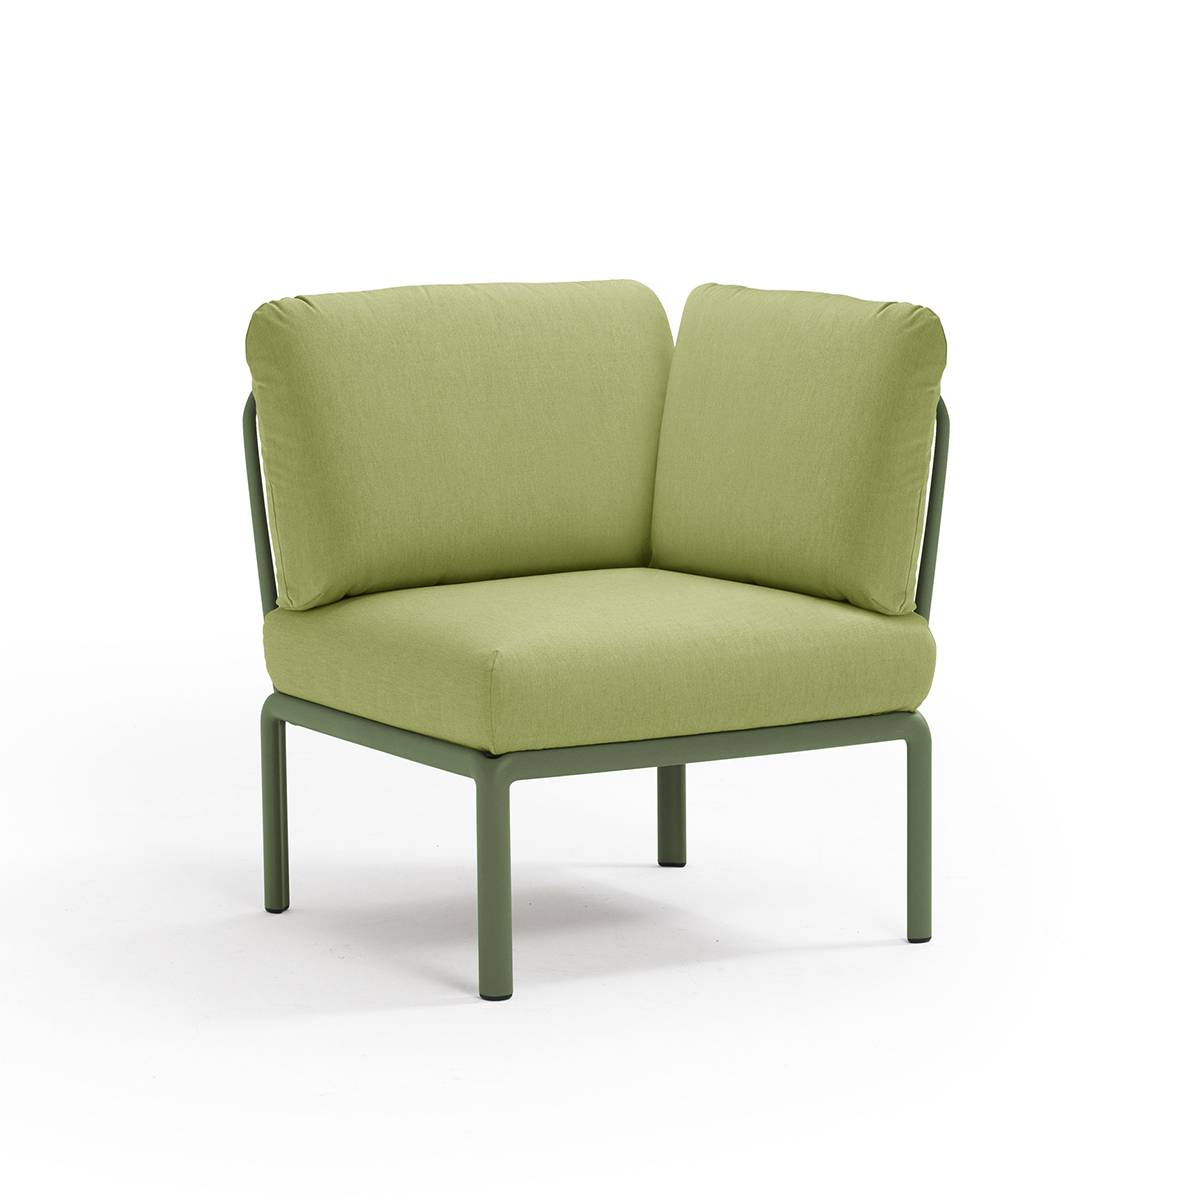 Градинскo ъглово кресло Komodo, agave